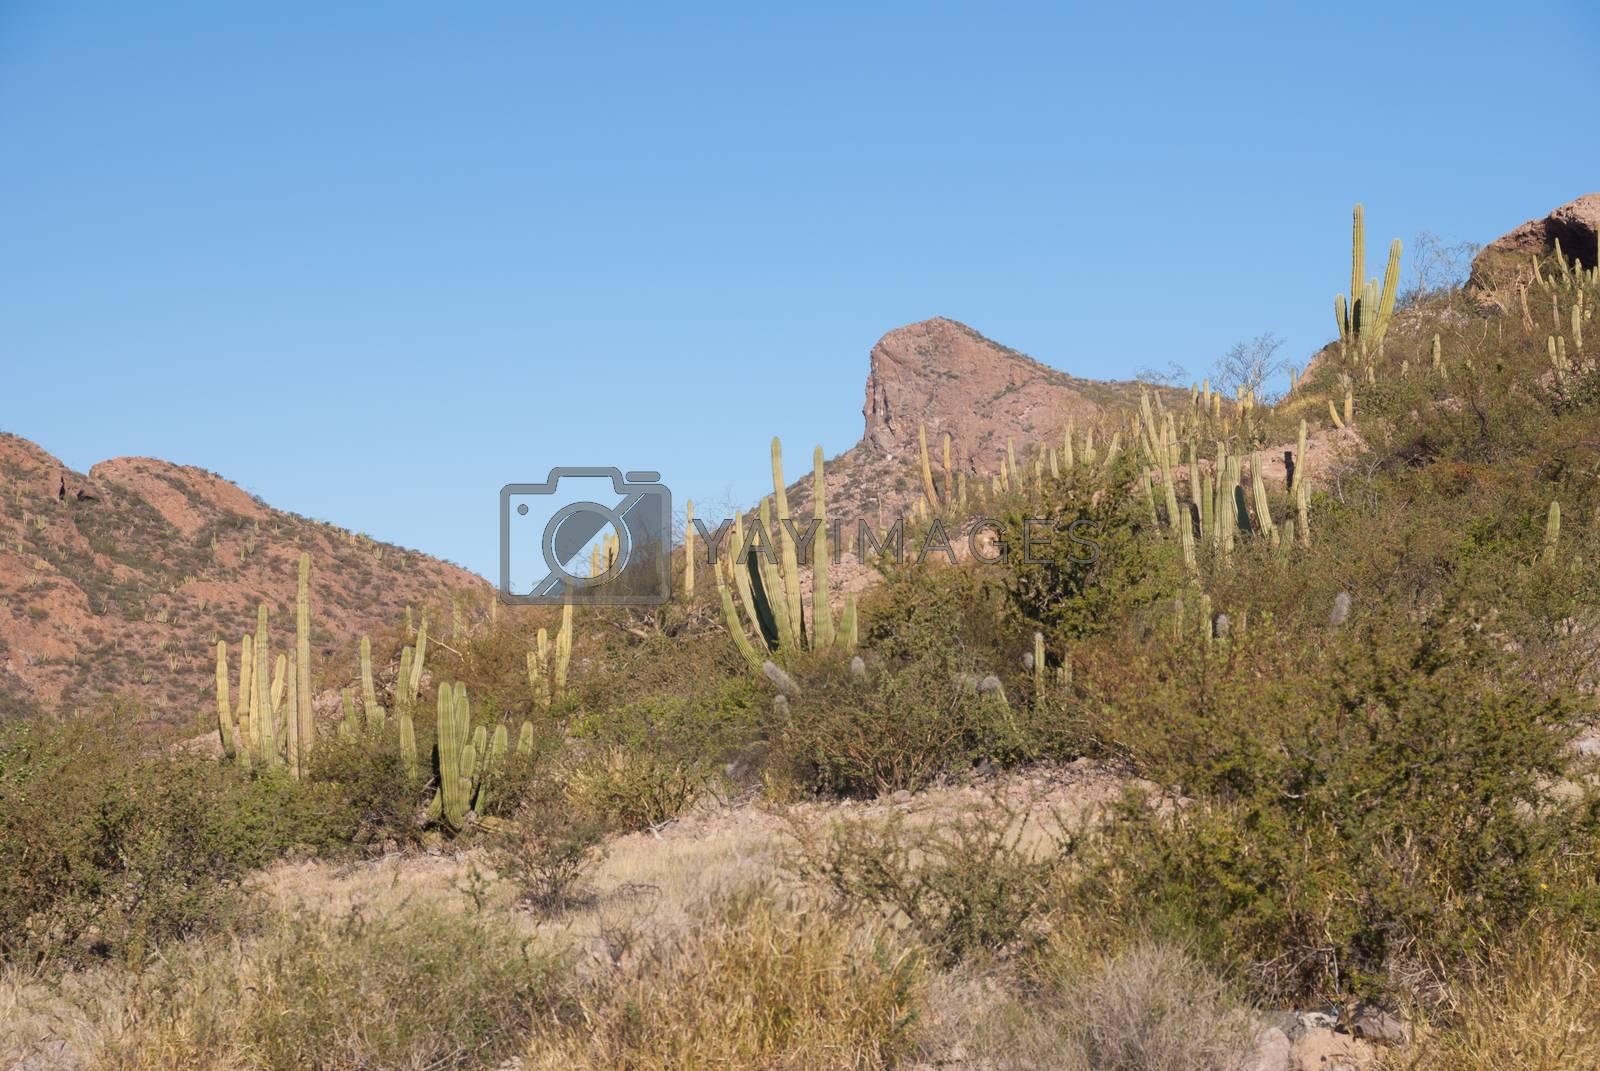 Mexican Organpipe cactus by emattil